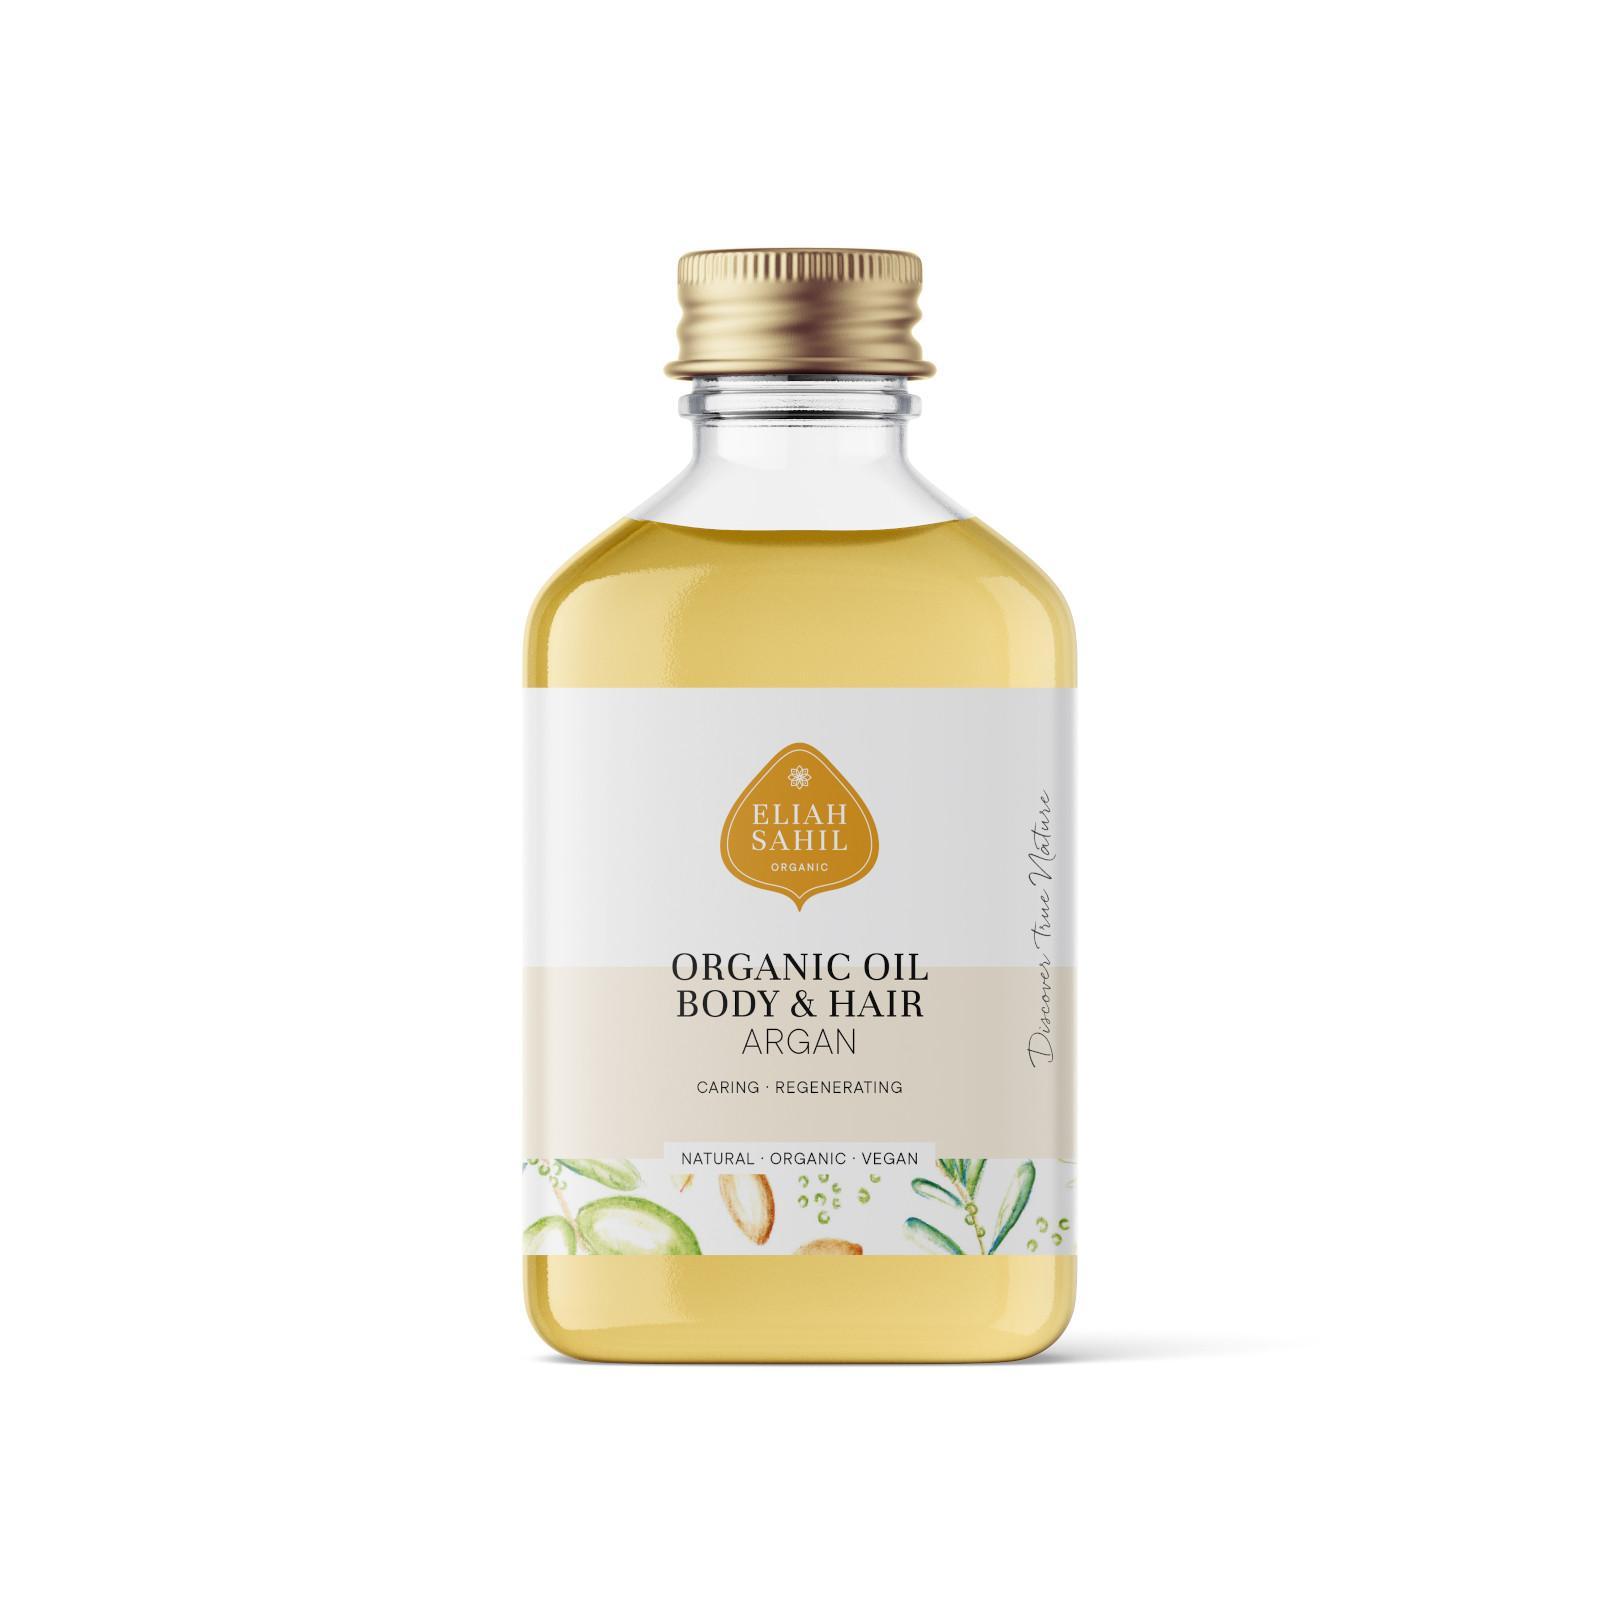 Eliah Sahil Organic Tělový a vlasový olej Argan 100 ml